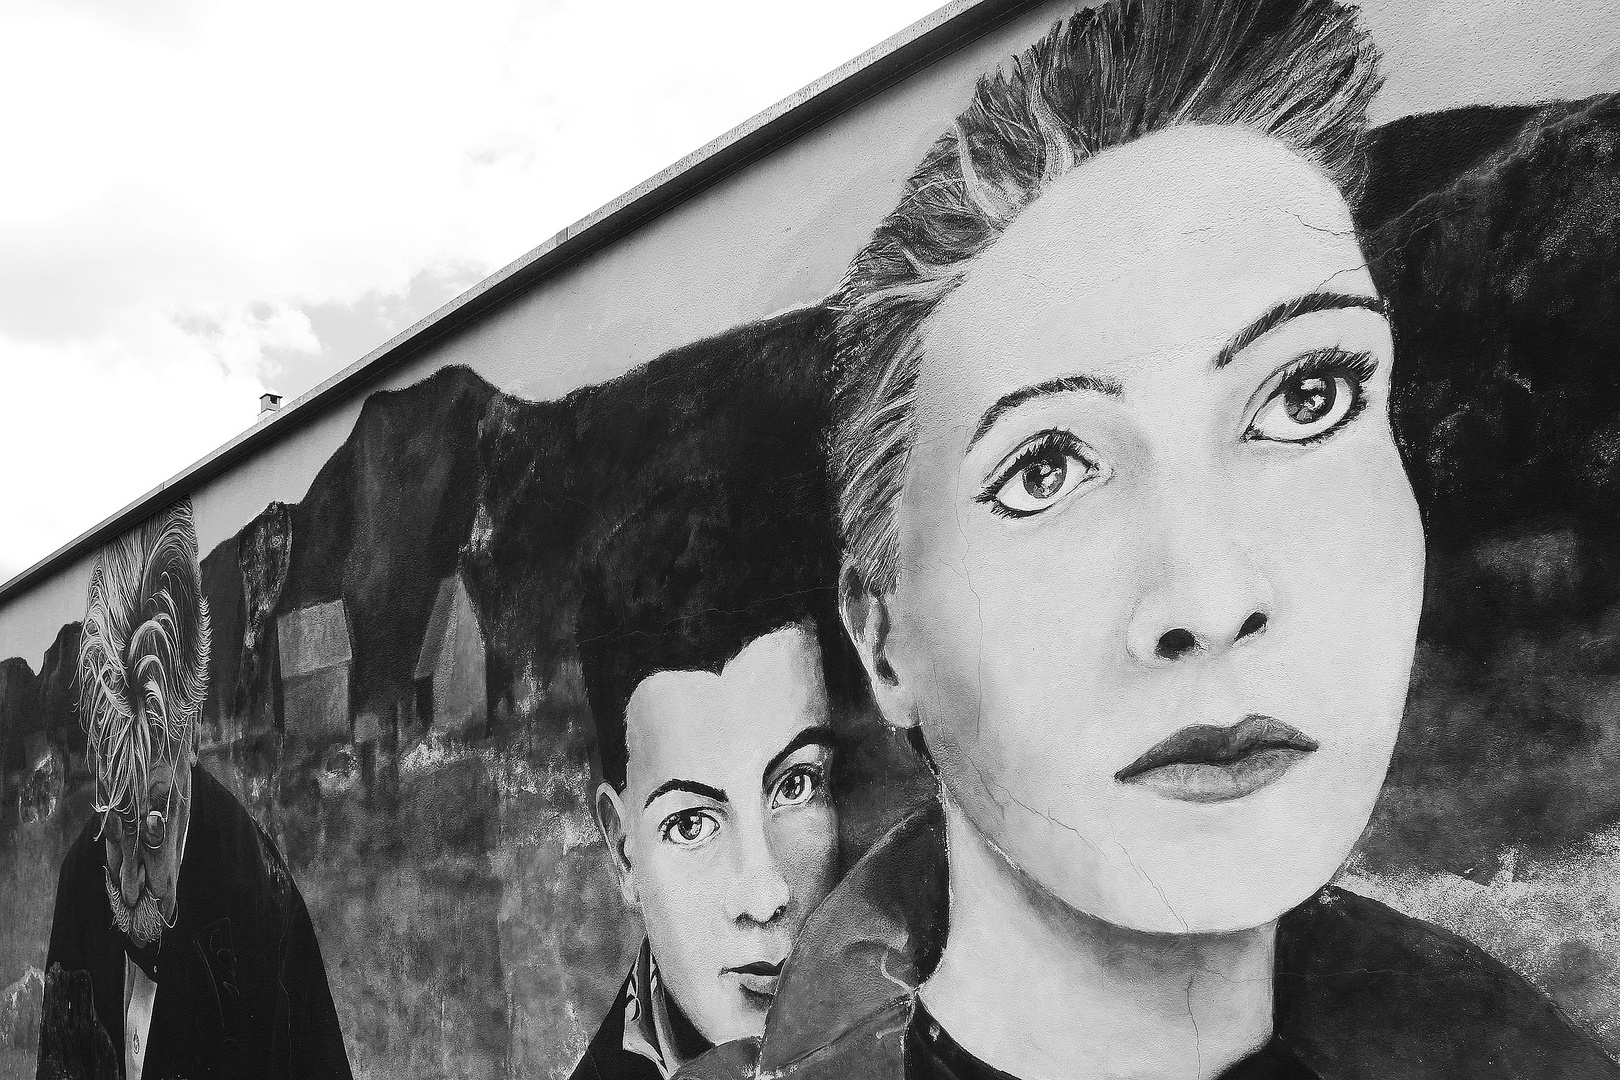 Wandgemälde am Bahnhof